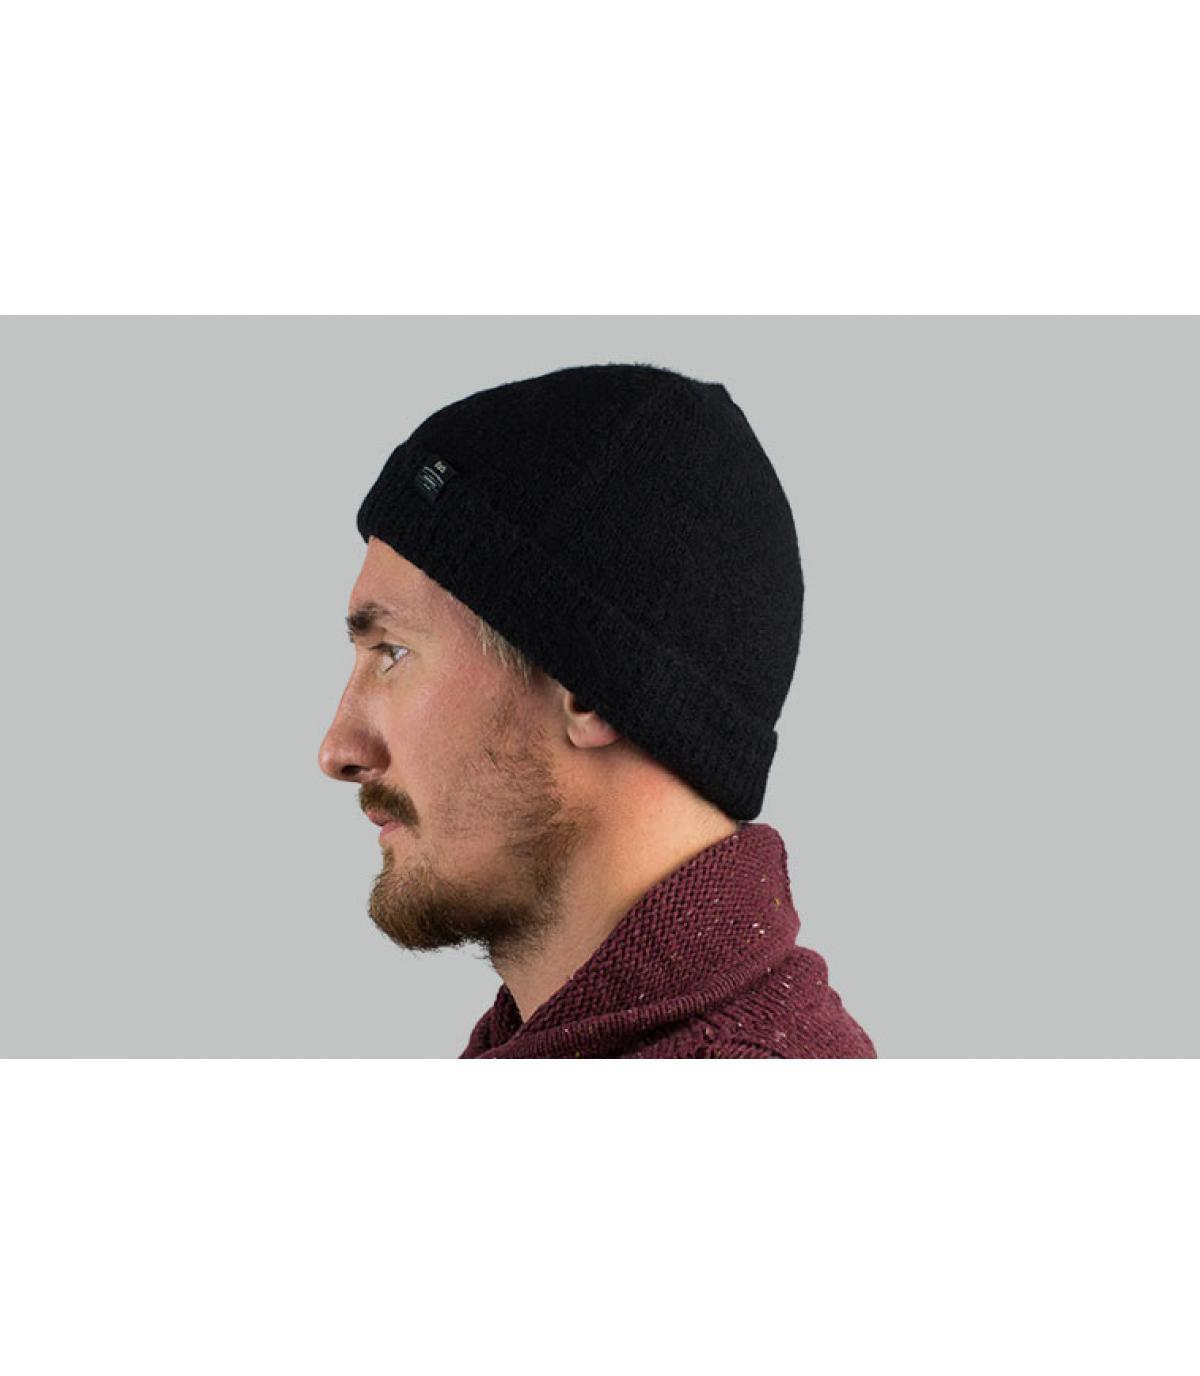 97f5da0ac3 Bonnet - Achat bonnets mode et tendance - Headict